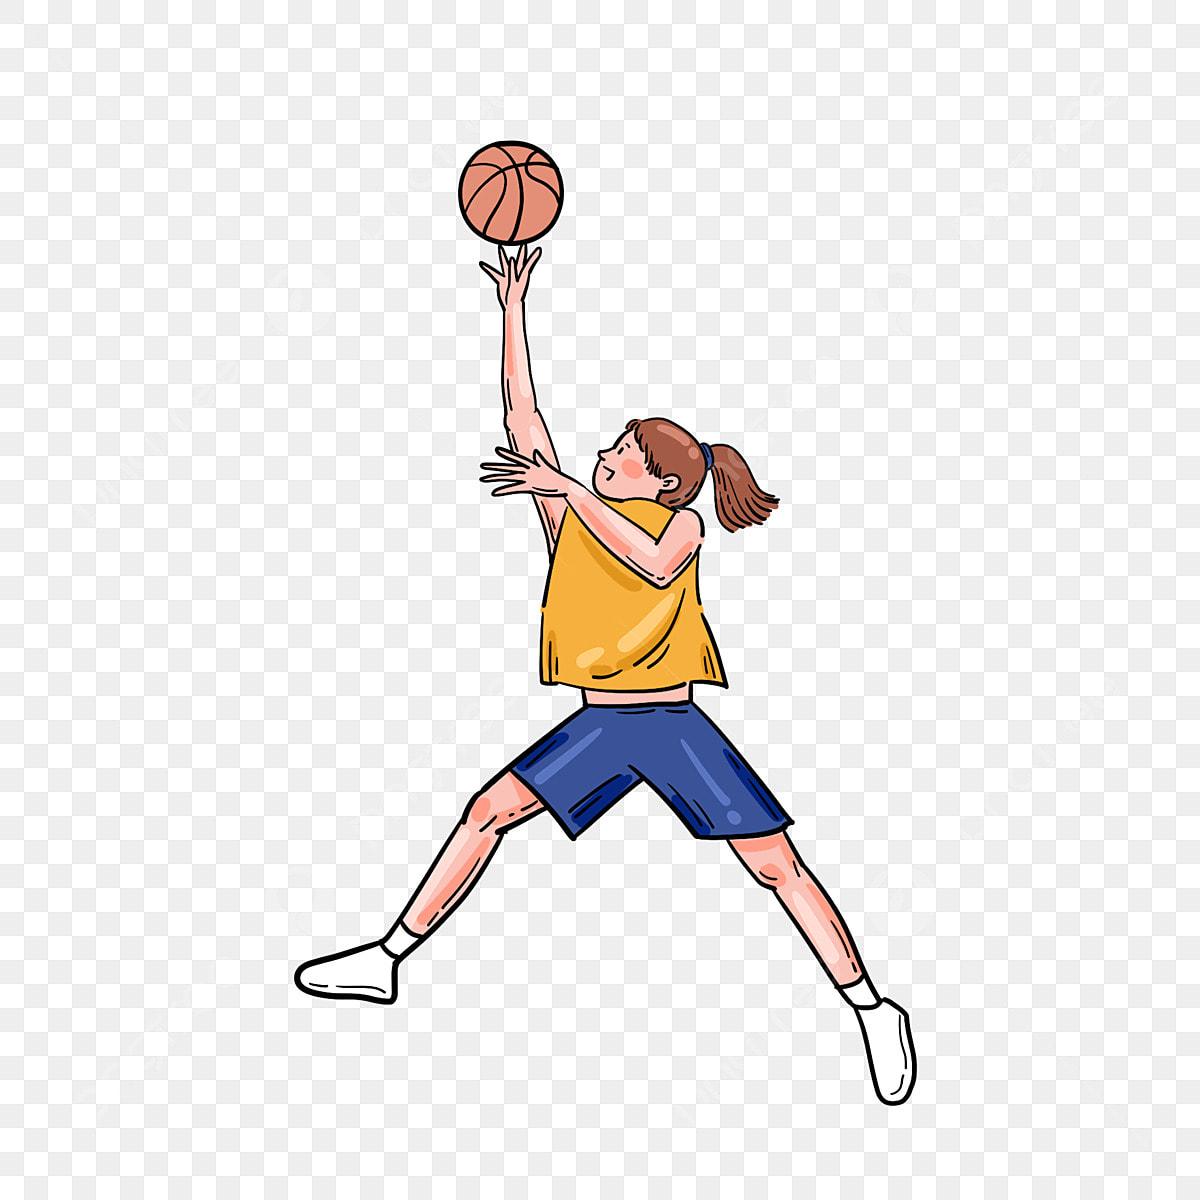 Girl Basketball Player Clipart | Clipart Panda - Free Clipart Images | Basketball  girls, Basketball players, Basketball clipart